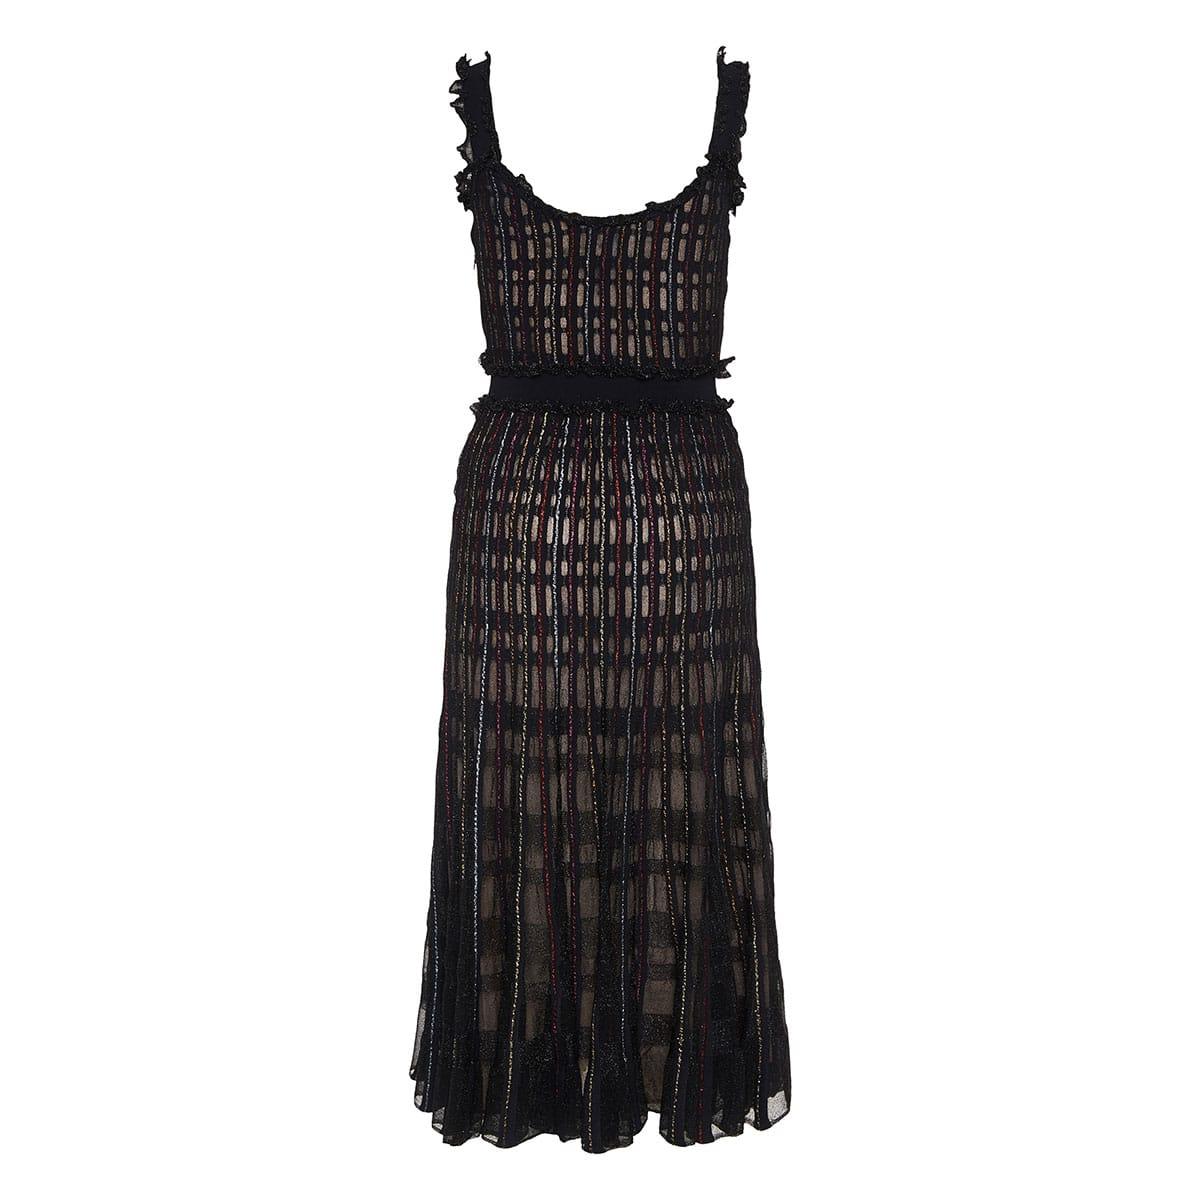 Sheer checked lurex midi dress